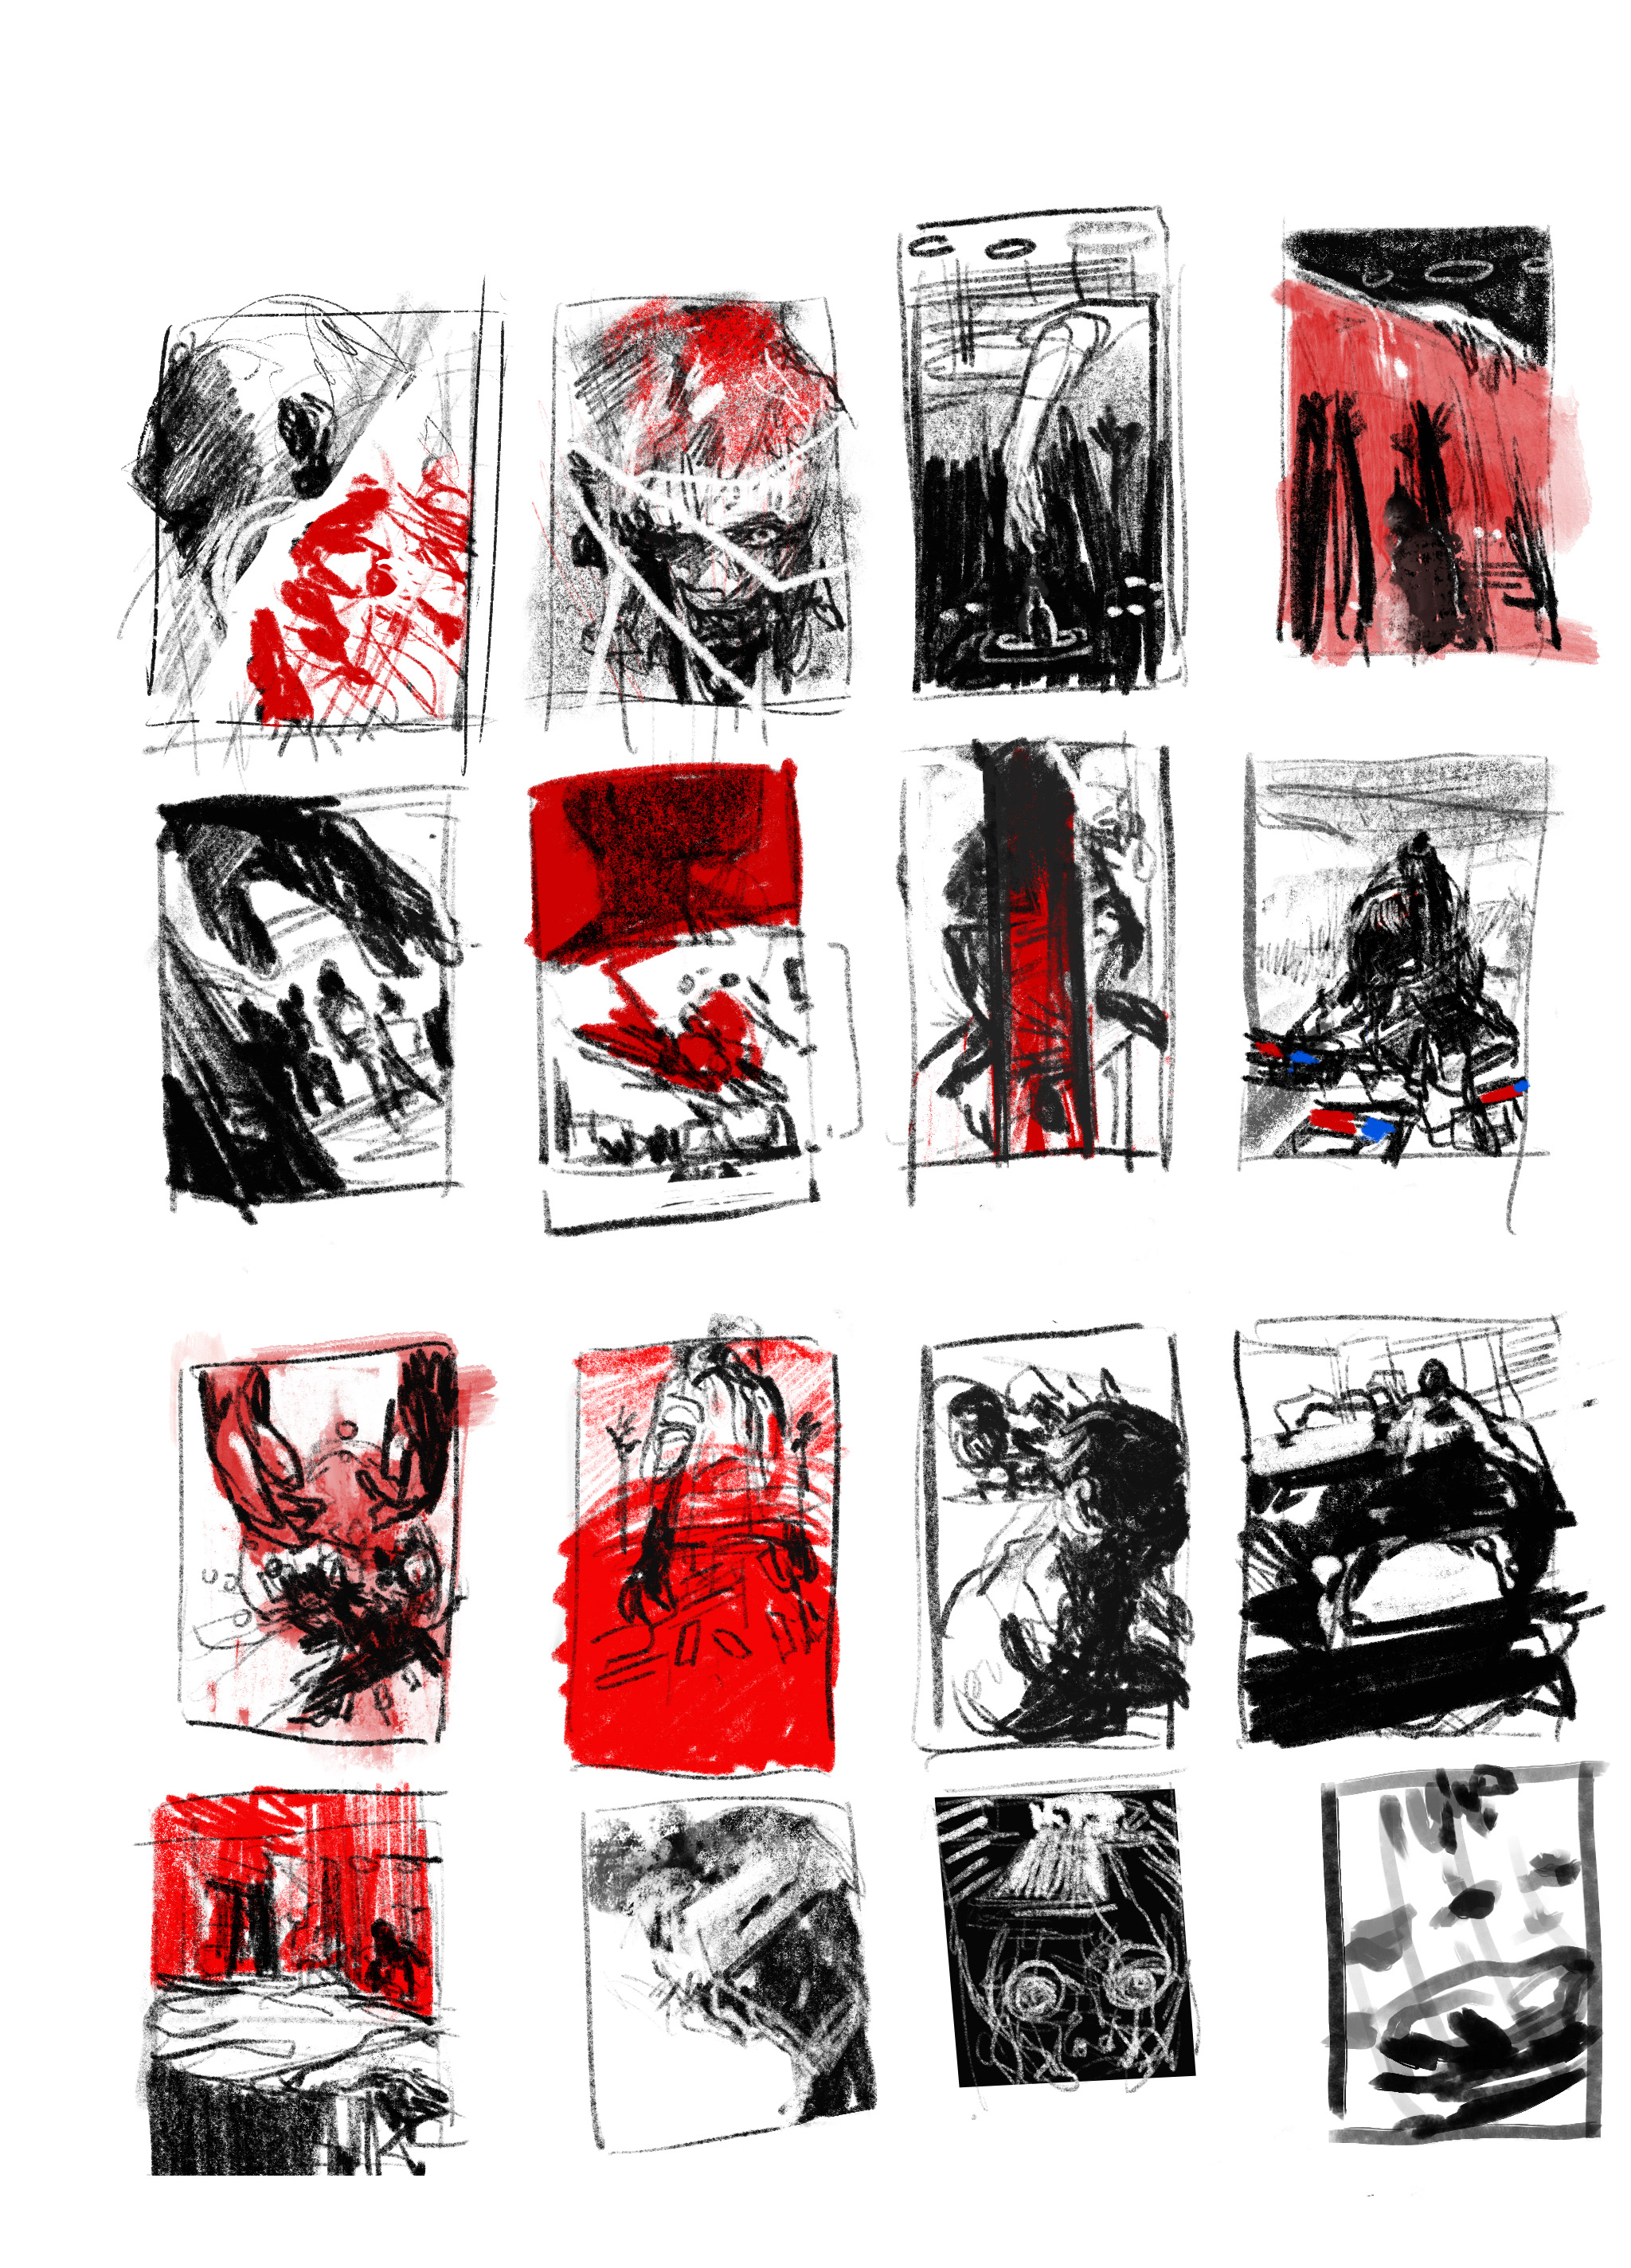 THR_MurderMystery_Thumbnails.jpg